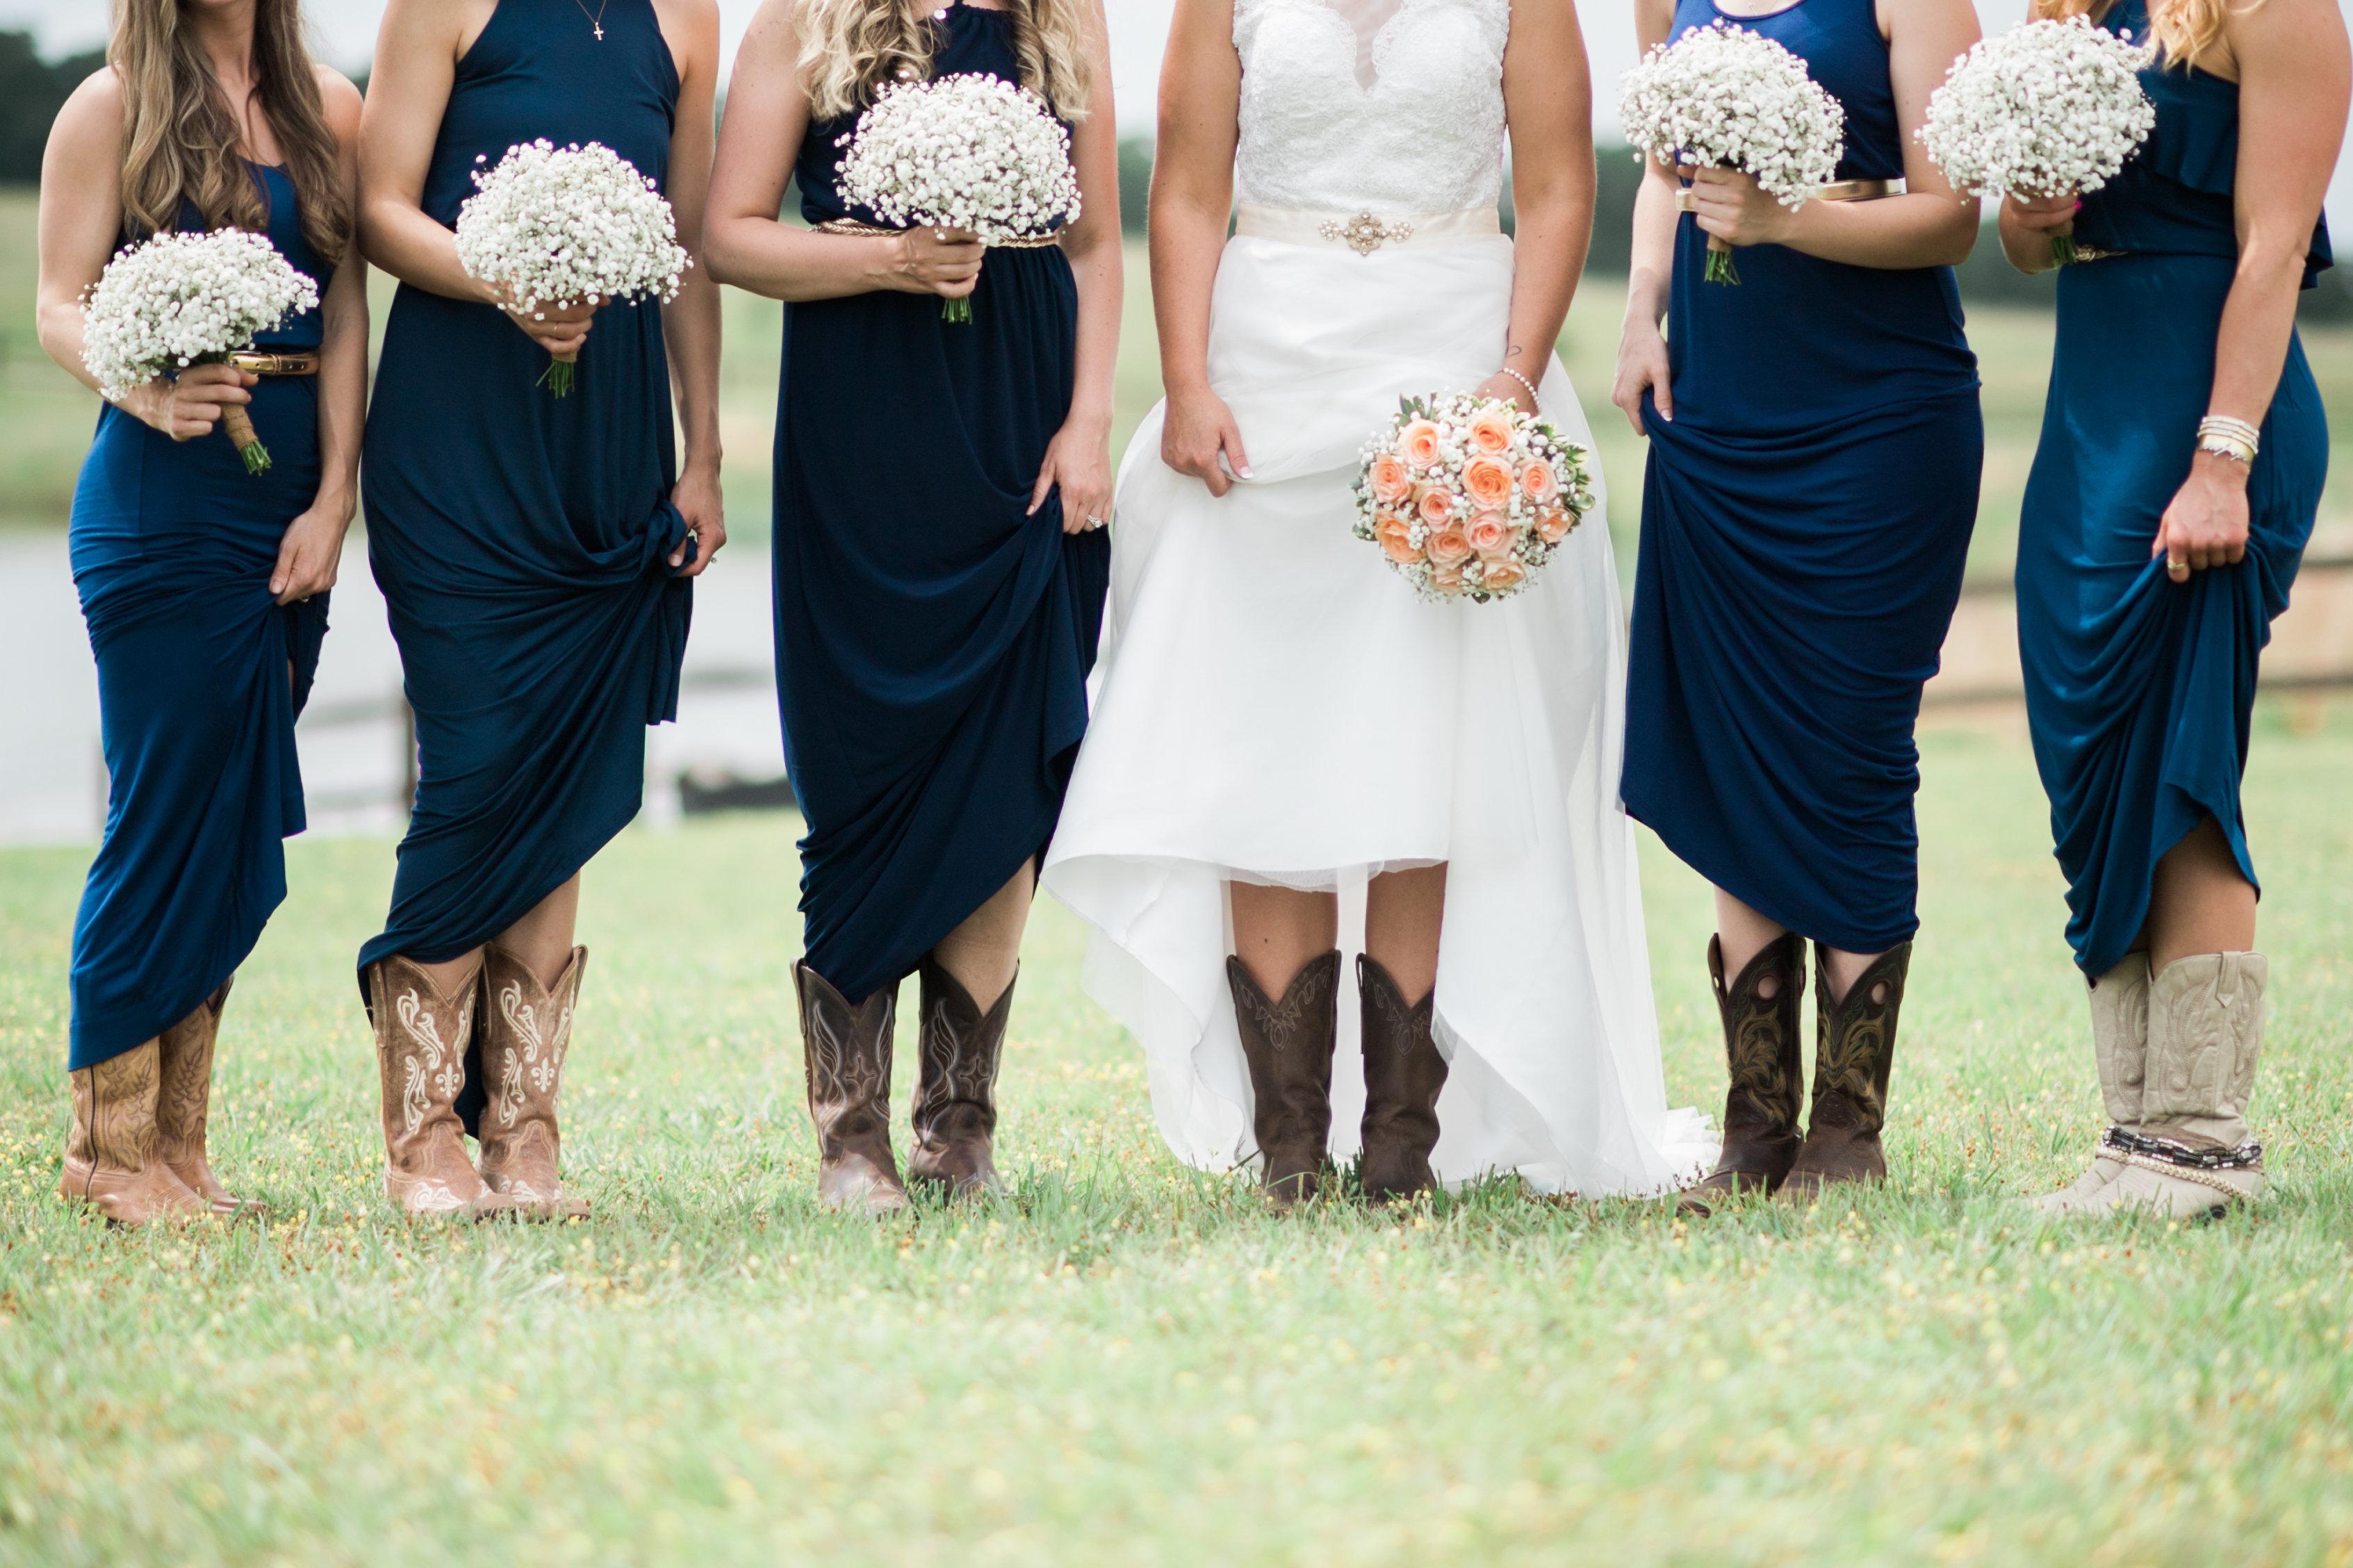 Tulsa Wedding Venues | What Shoes Do I